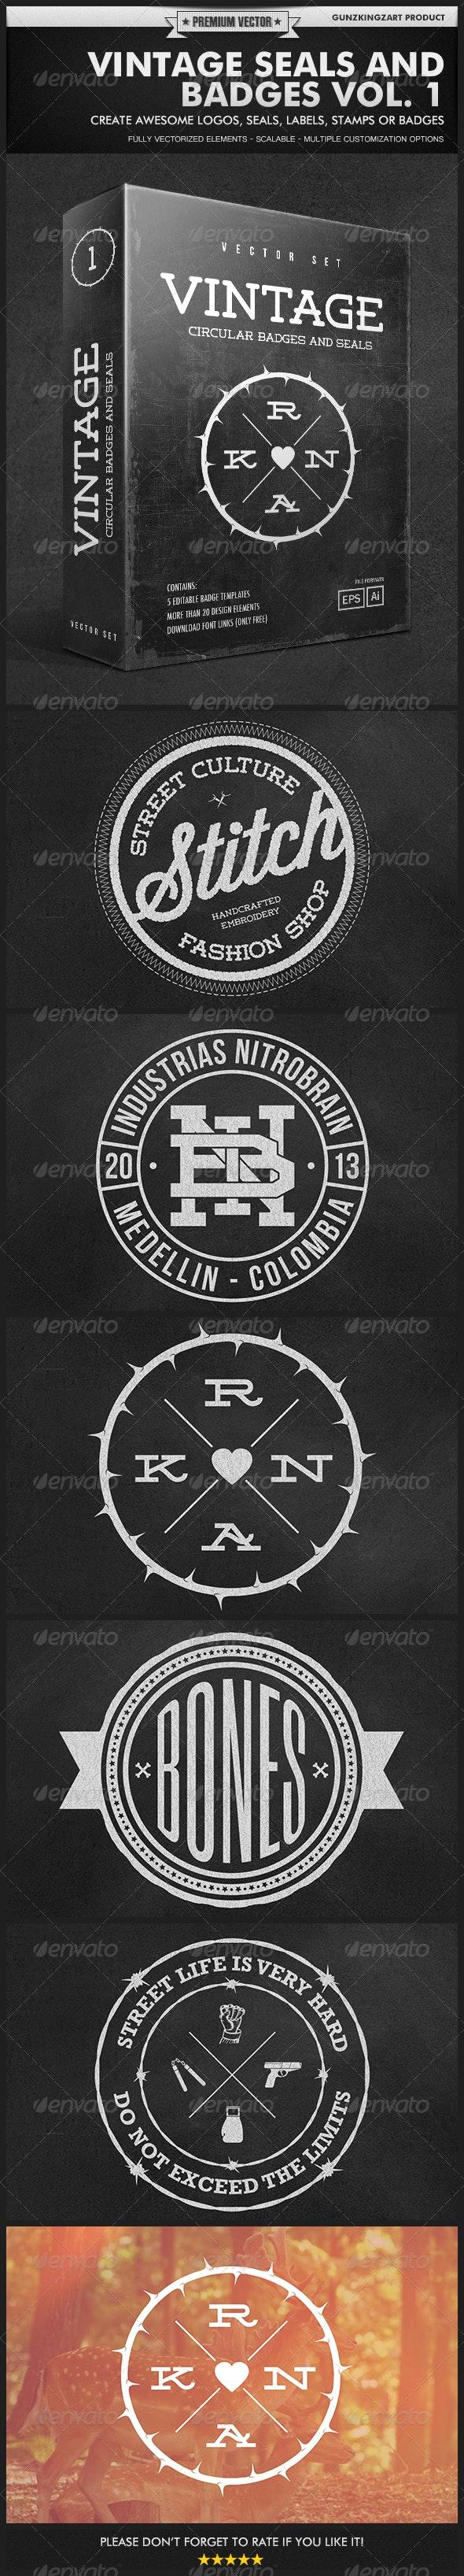 Vintage Seals and Badges Vol. 1 - Badges & Stickers Web Elements